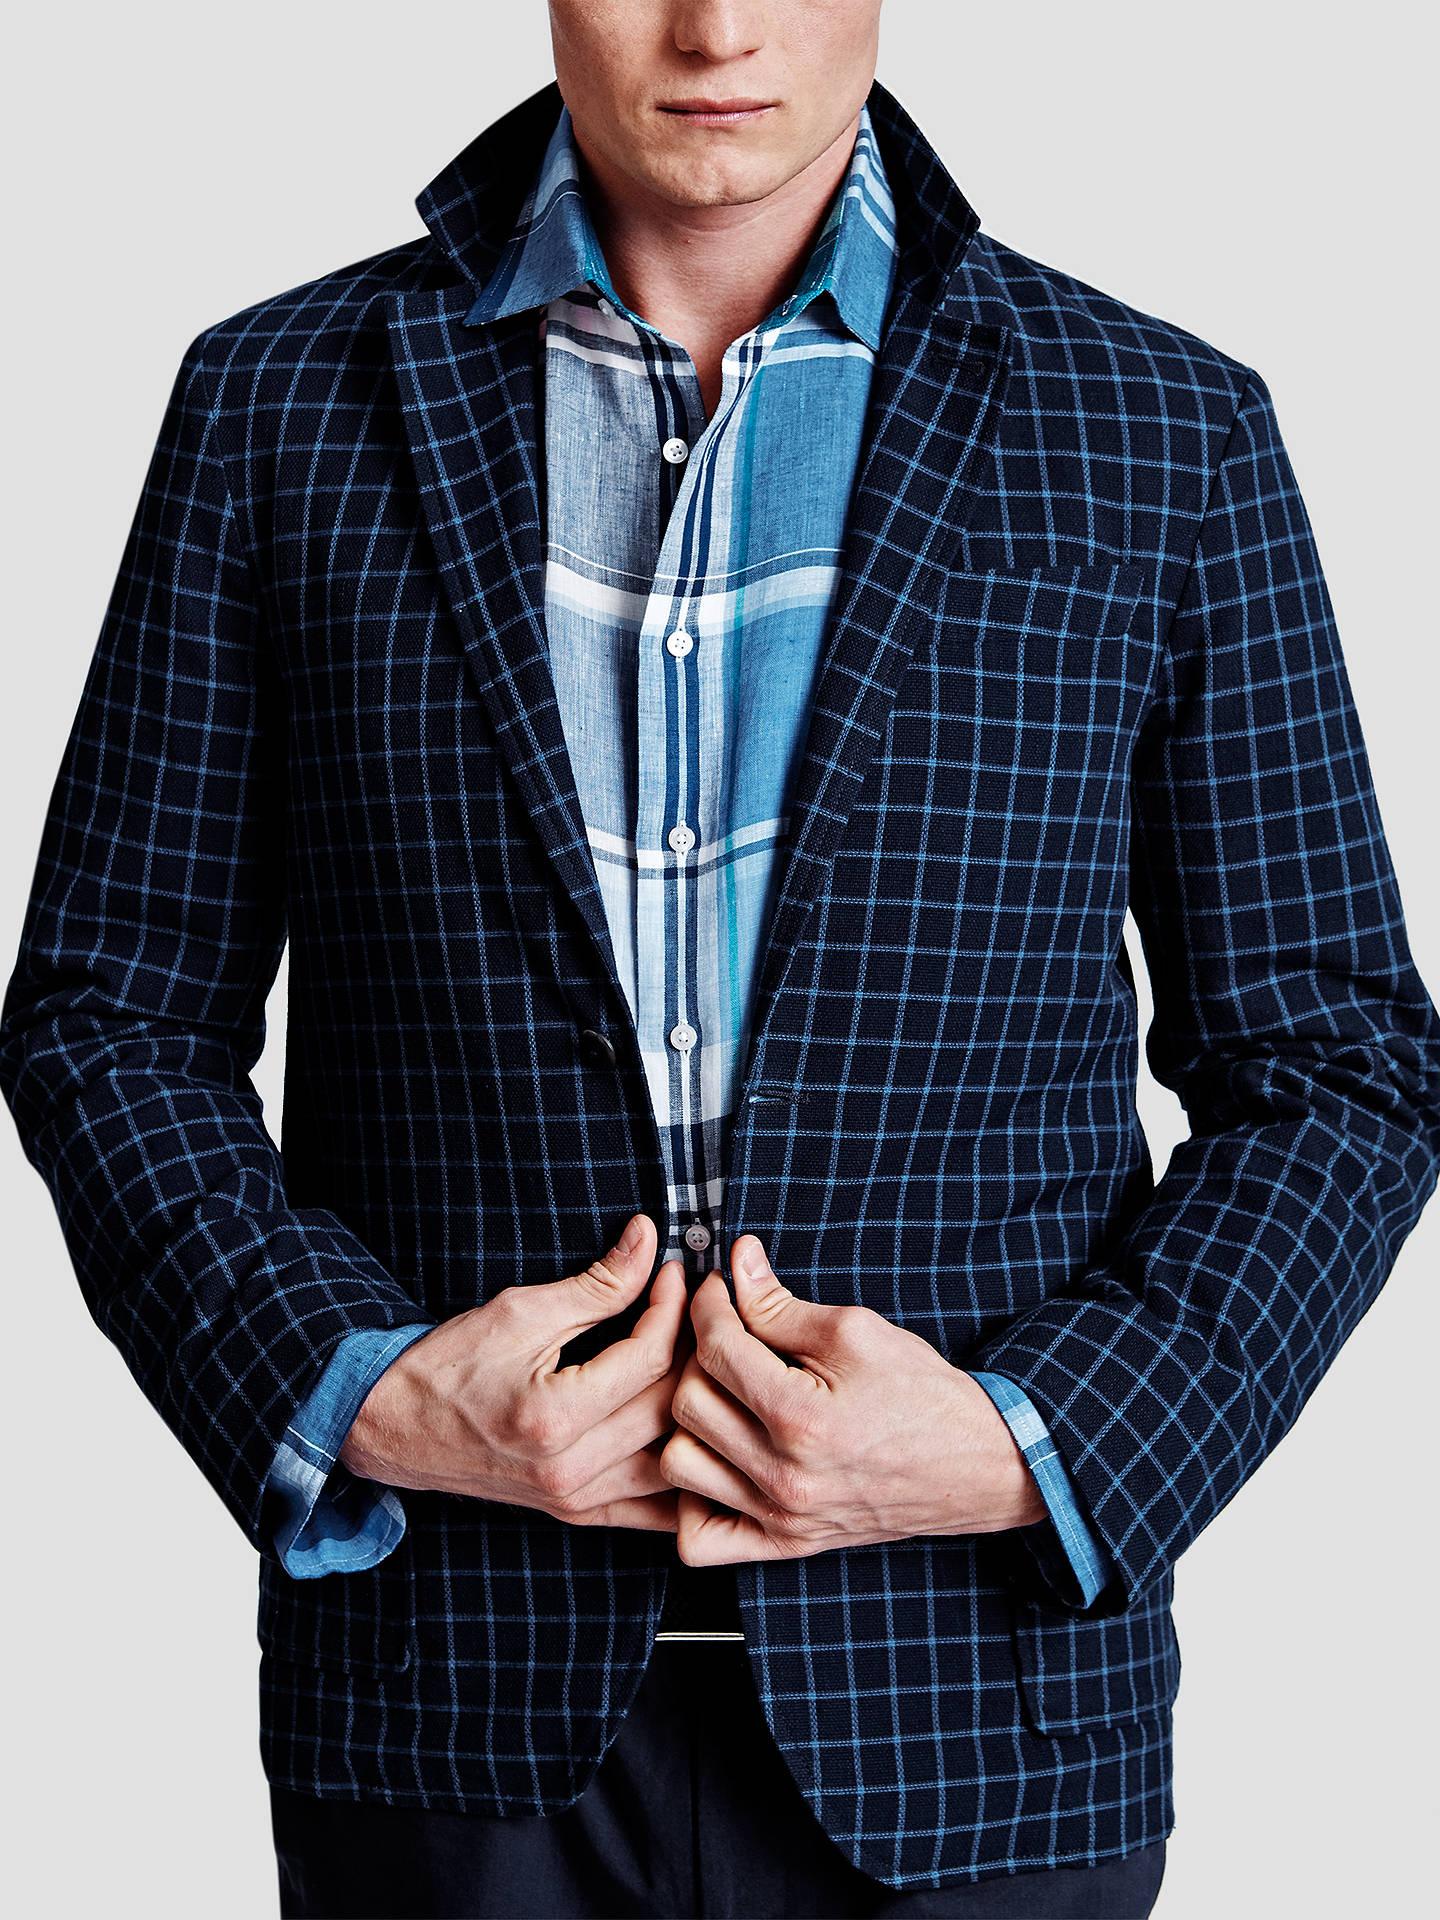 3ce3a3345ce5 ... Buy Thomas Pink Milburn Check Cotton Blazer, Navy/Blue, 34R Online at  johnlewis ...